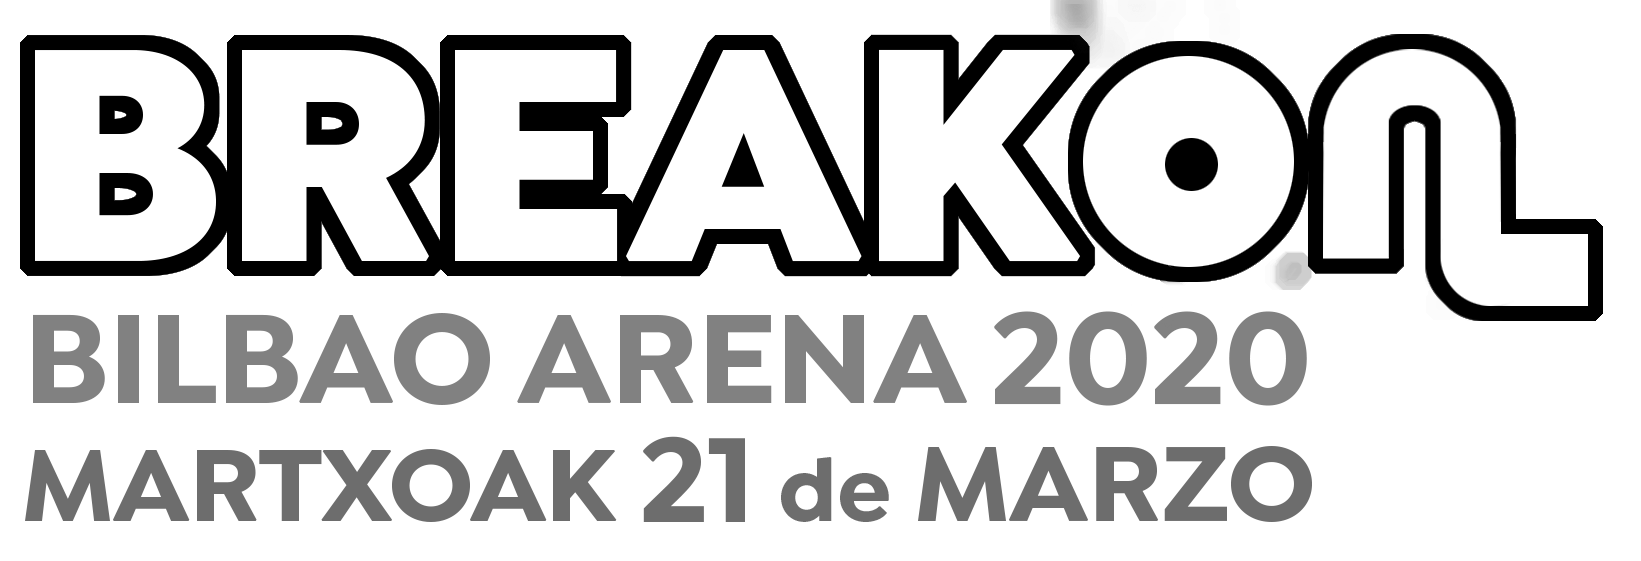 BreakOnStage